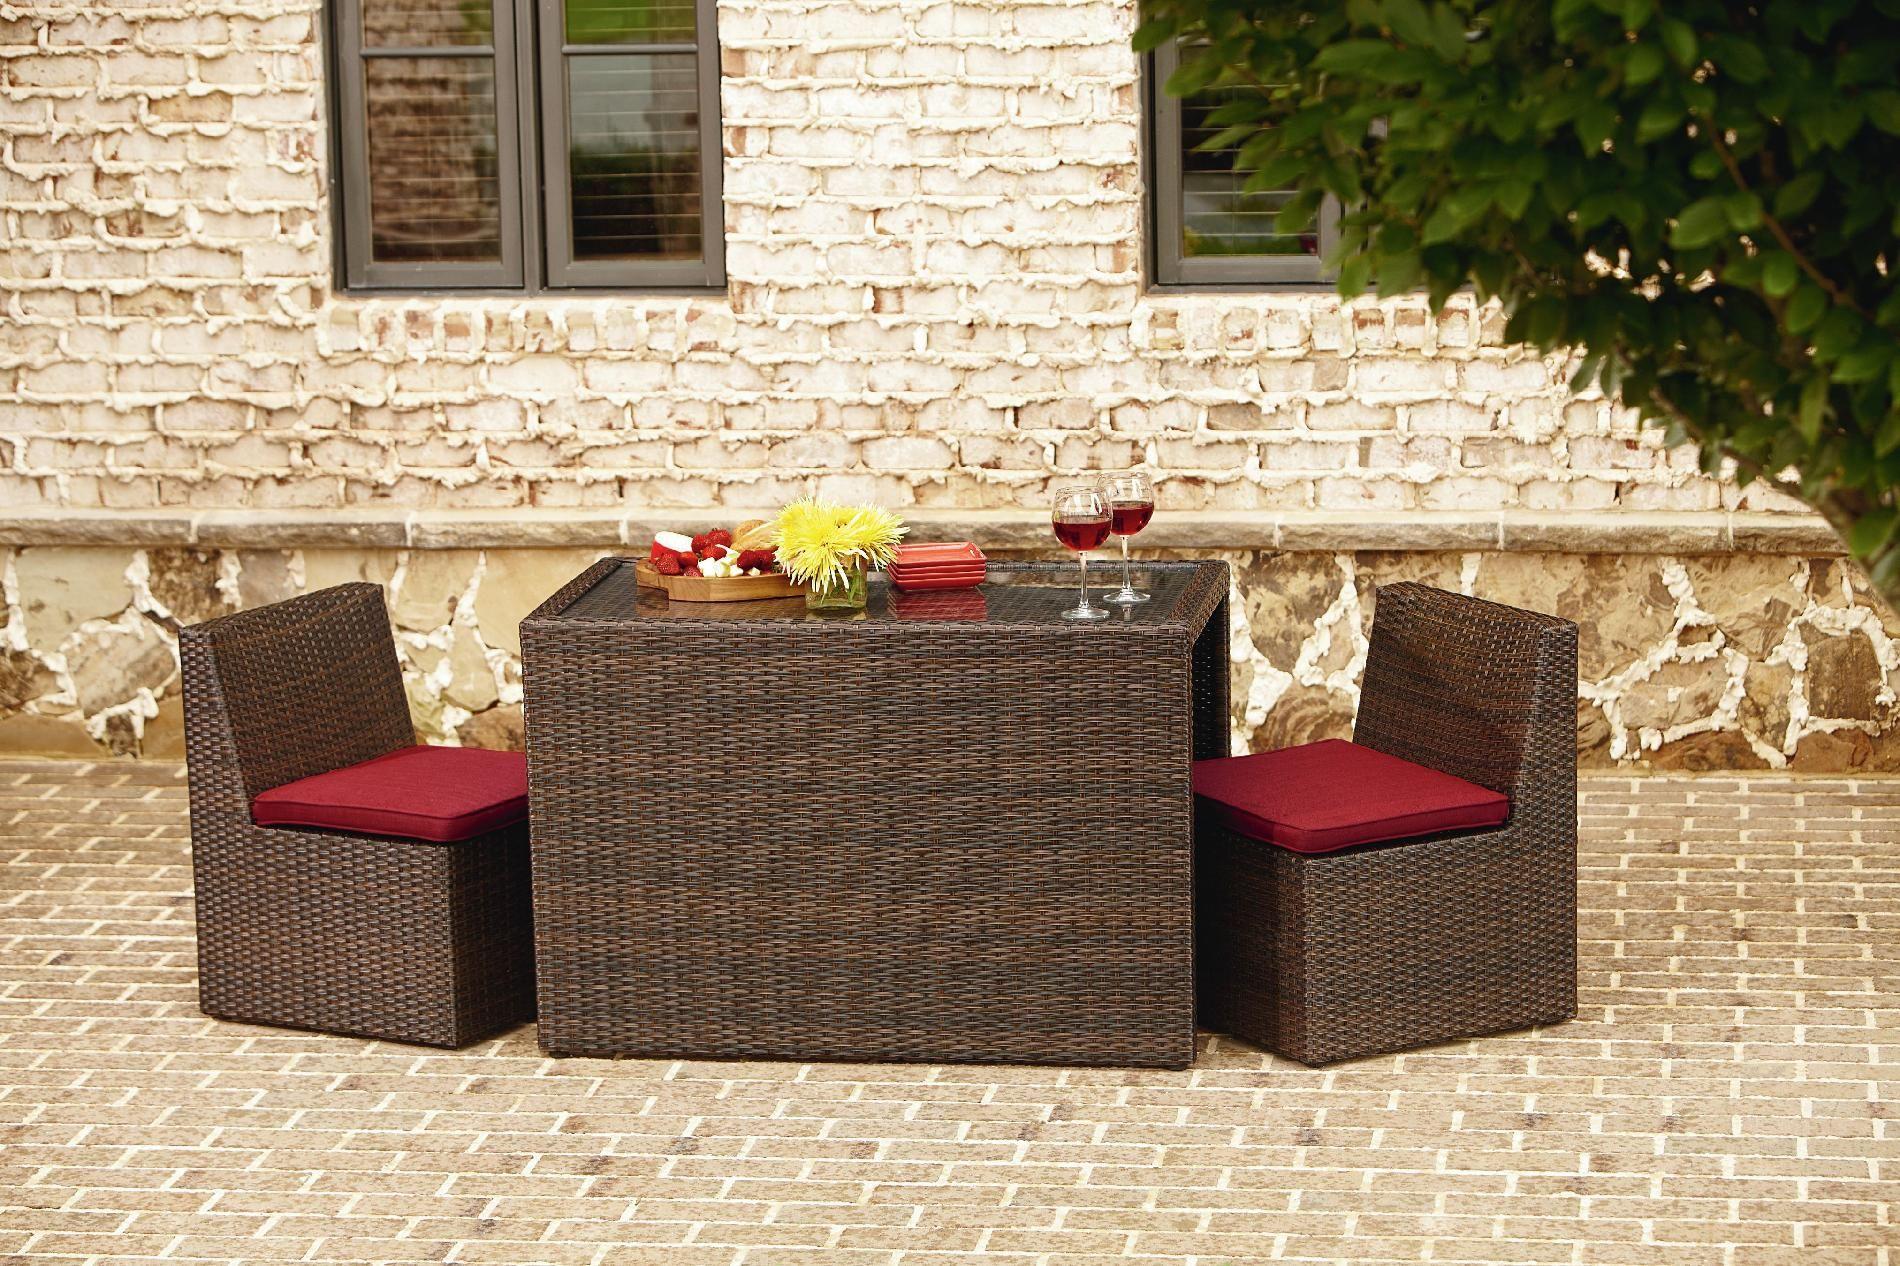 La Z Boy Outdoor Brody 3 Piece Bistro Set Living Patio Furniture Small E Sets